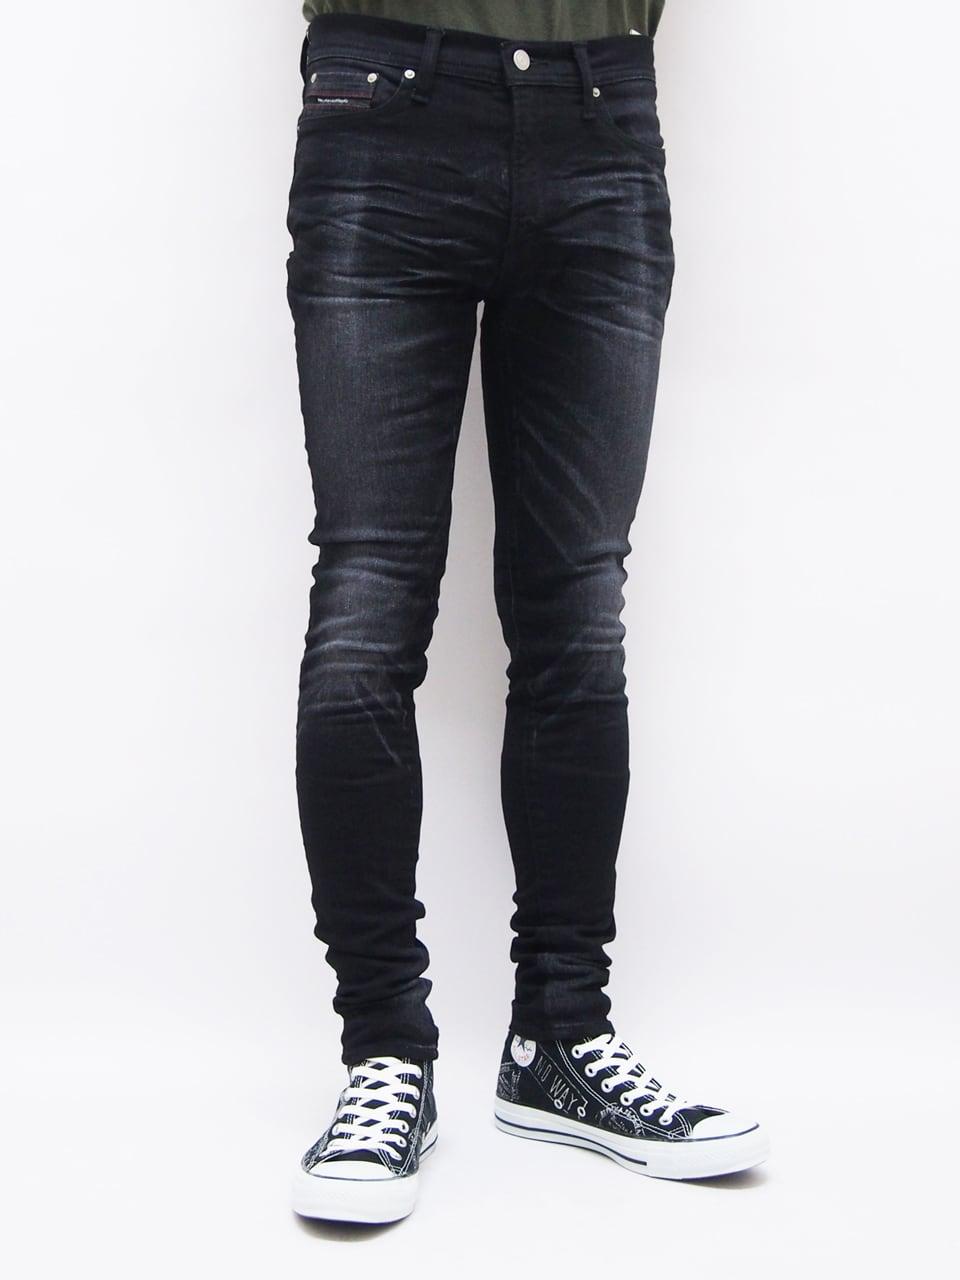 RESOUND CLOTHING (リサウンドクロージング) LOAD DENIM / BK SOLID BASIC-SSK-004-5